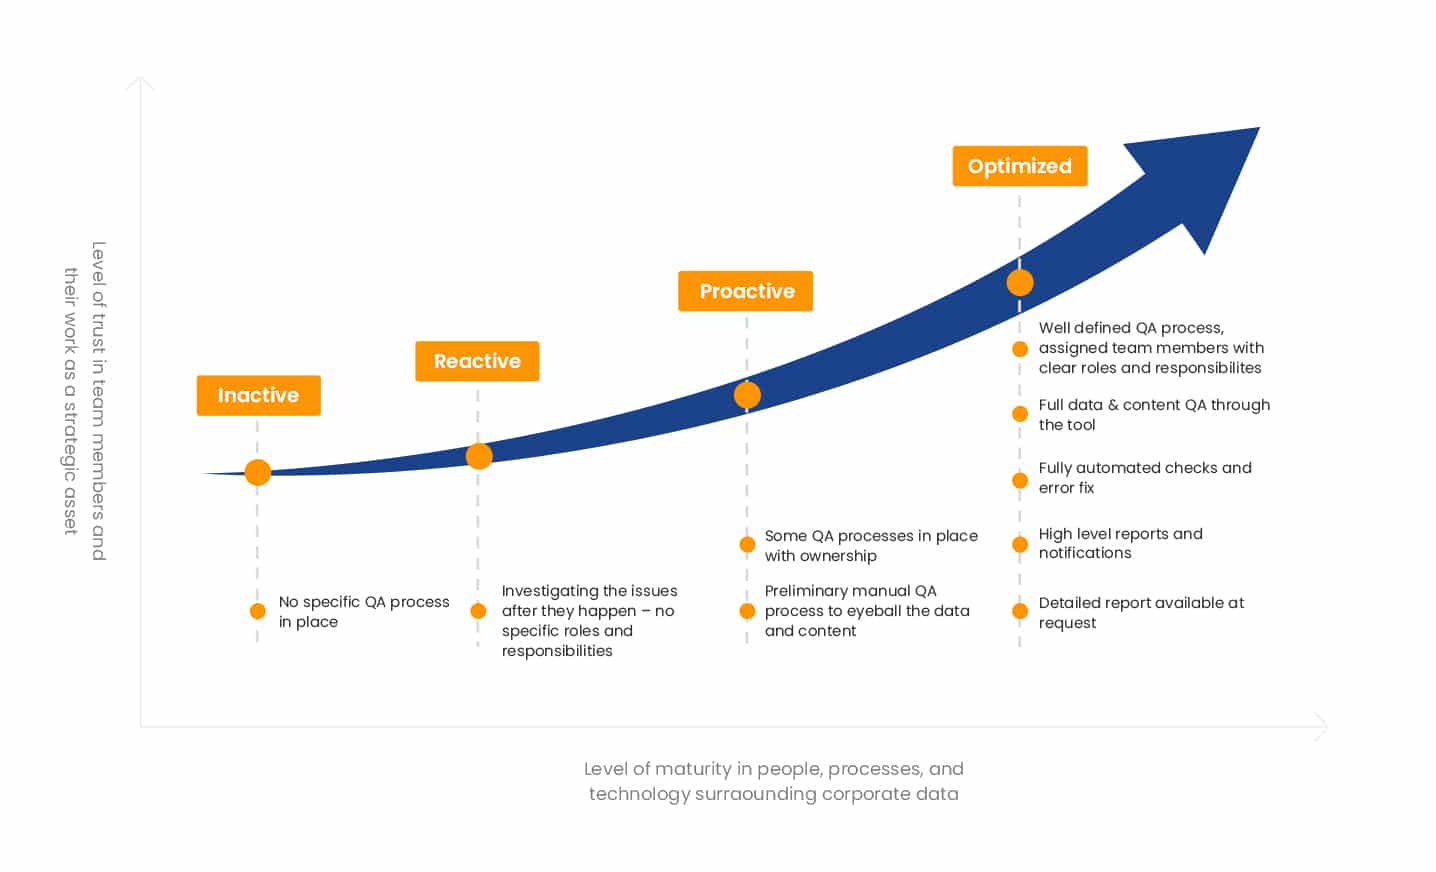 level of trust vs level of maturity graph